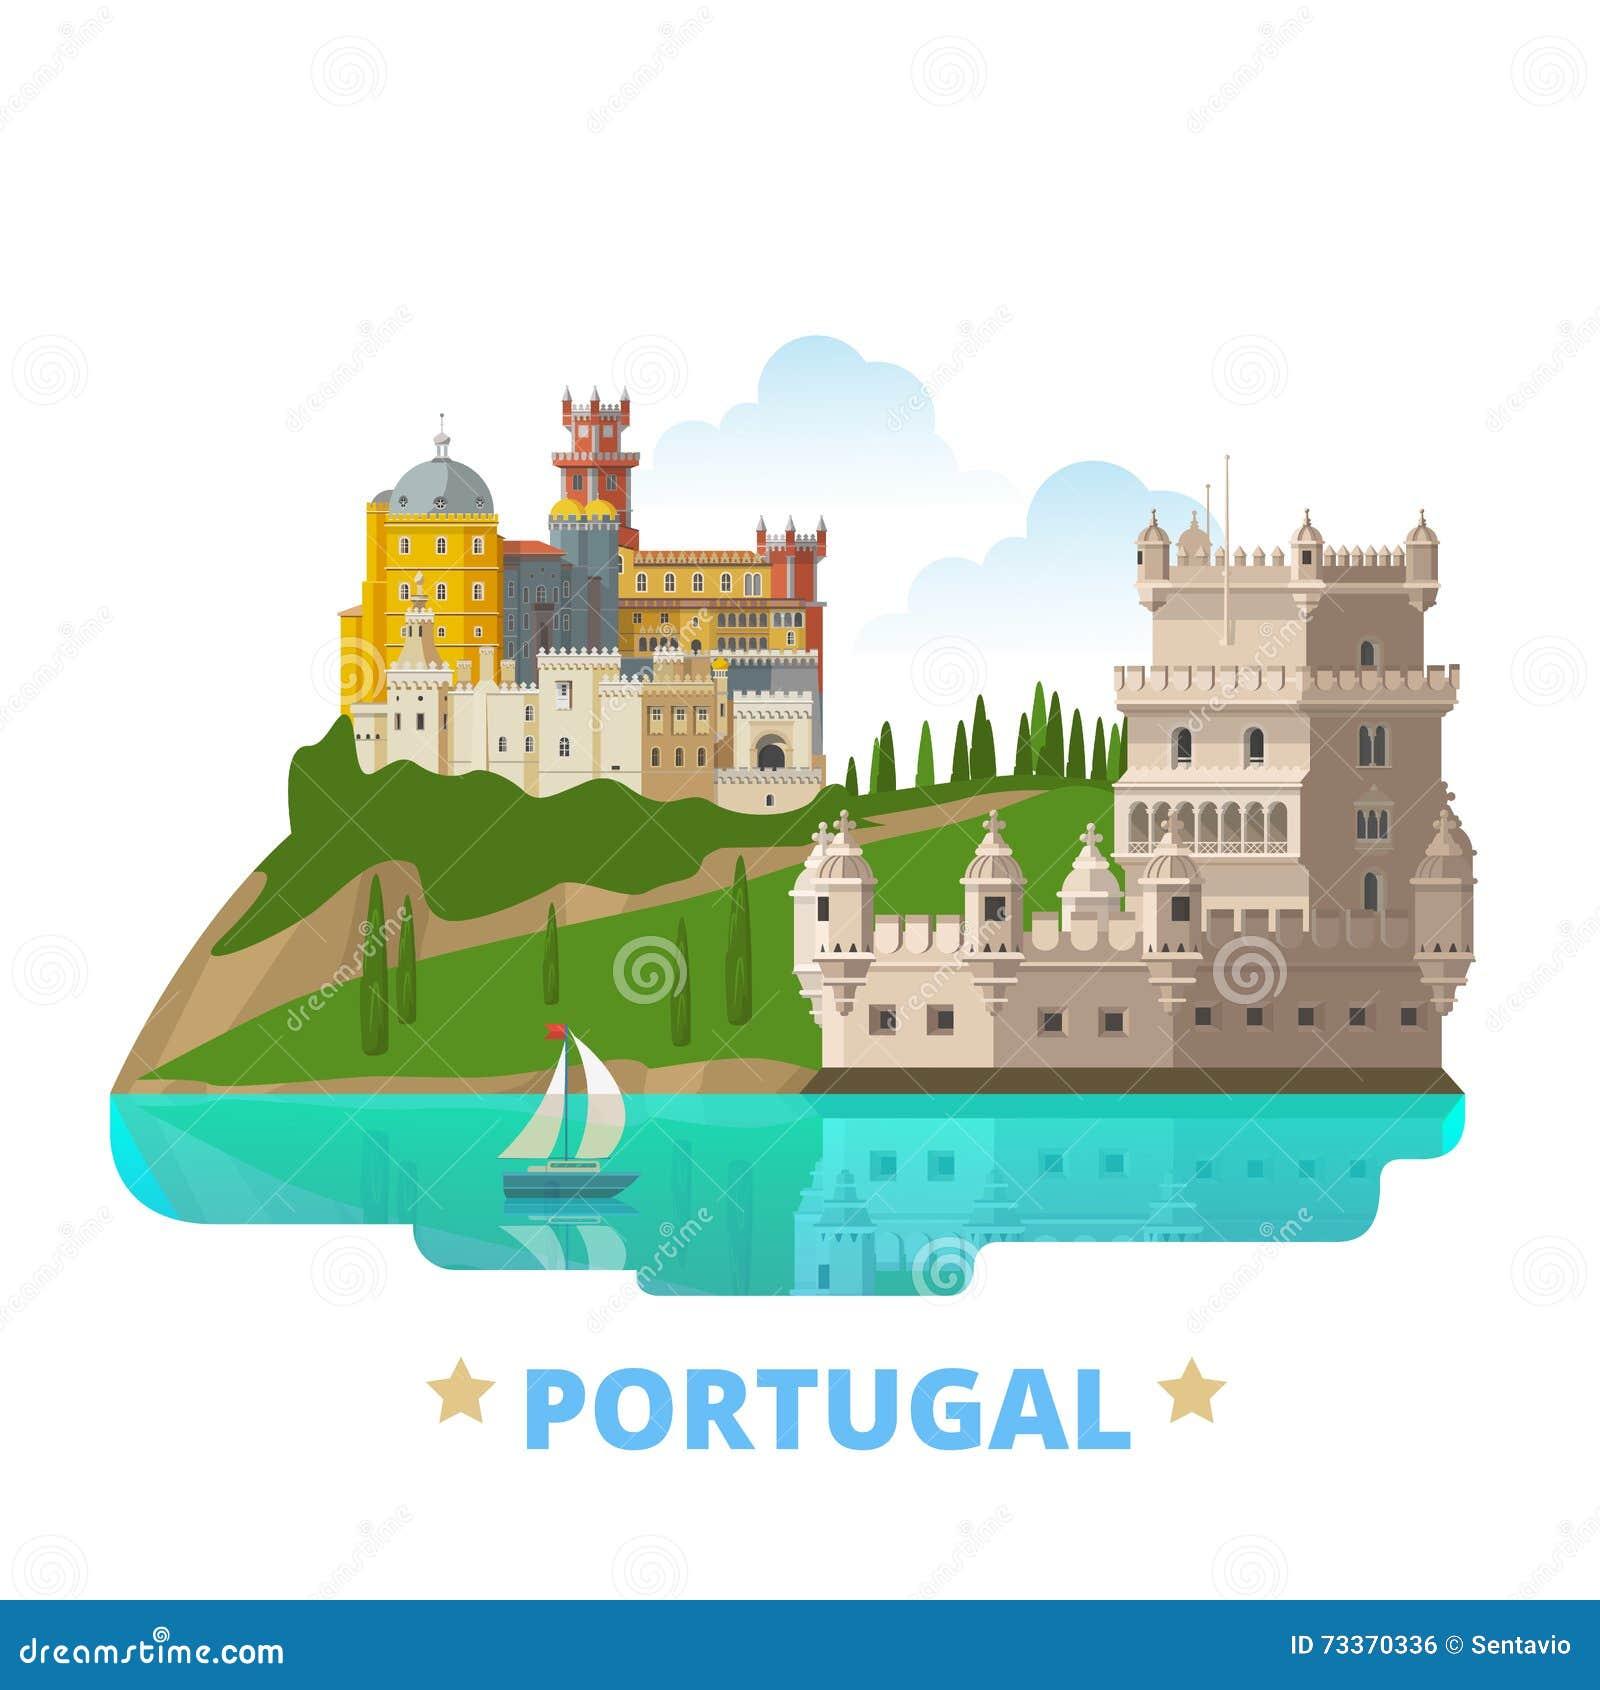 Styl Liso Dos Desenhos Animados Do Molde Do Projeto Do Pais De Portugal Ilustracao Do Vetor Ilustracao De Liso Styl 73370336